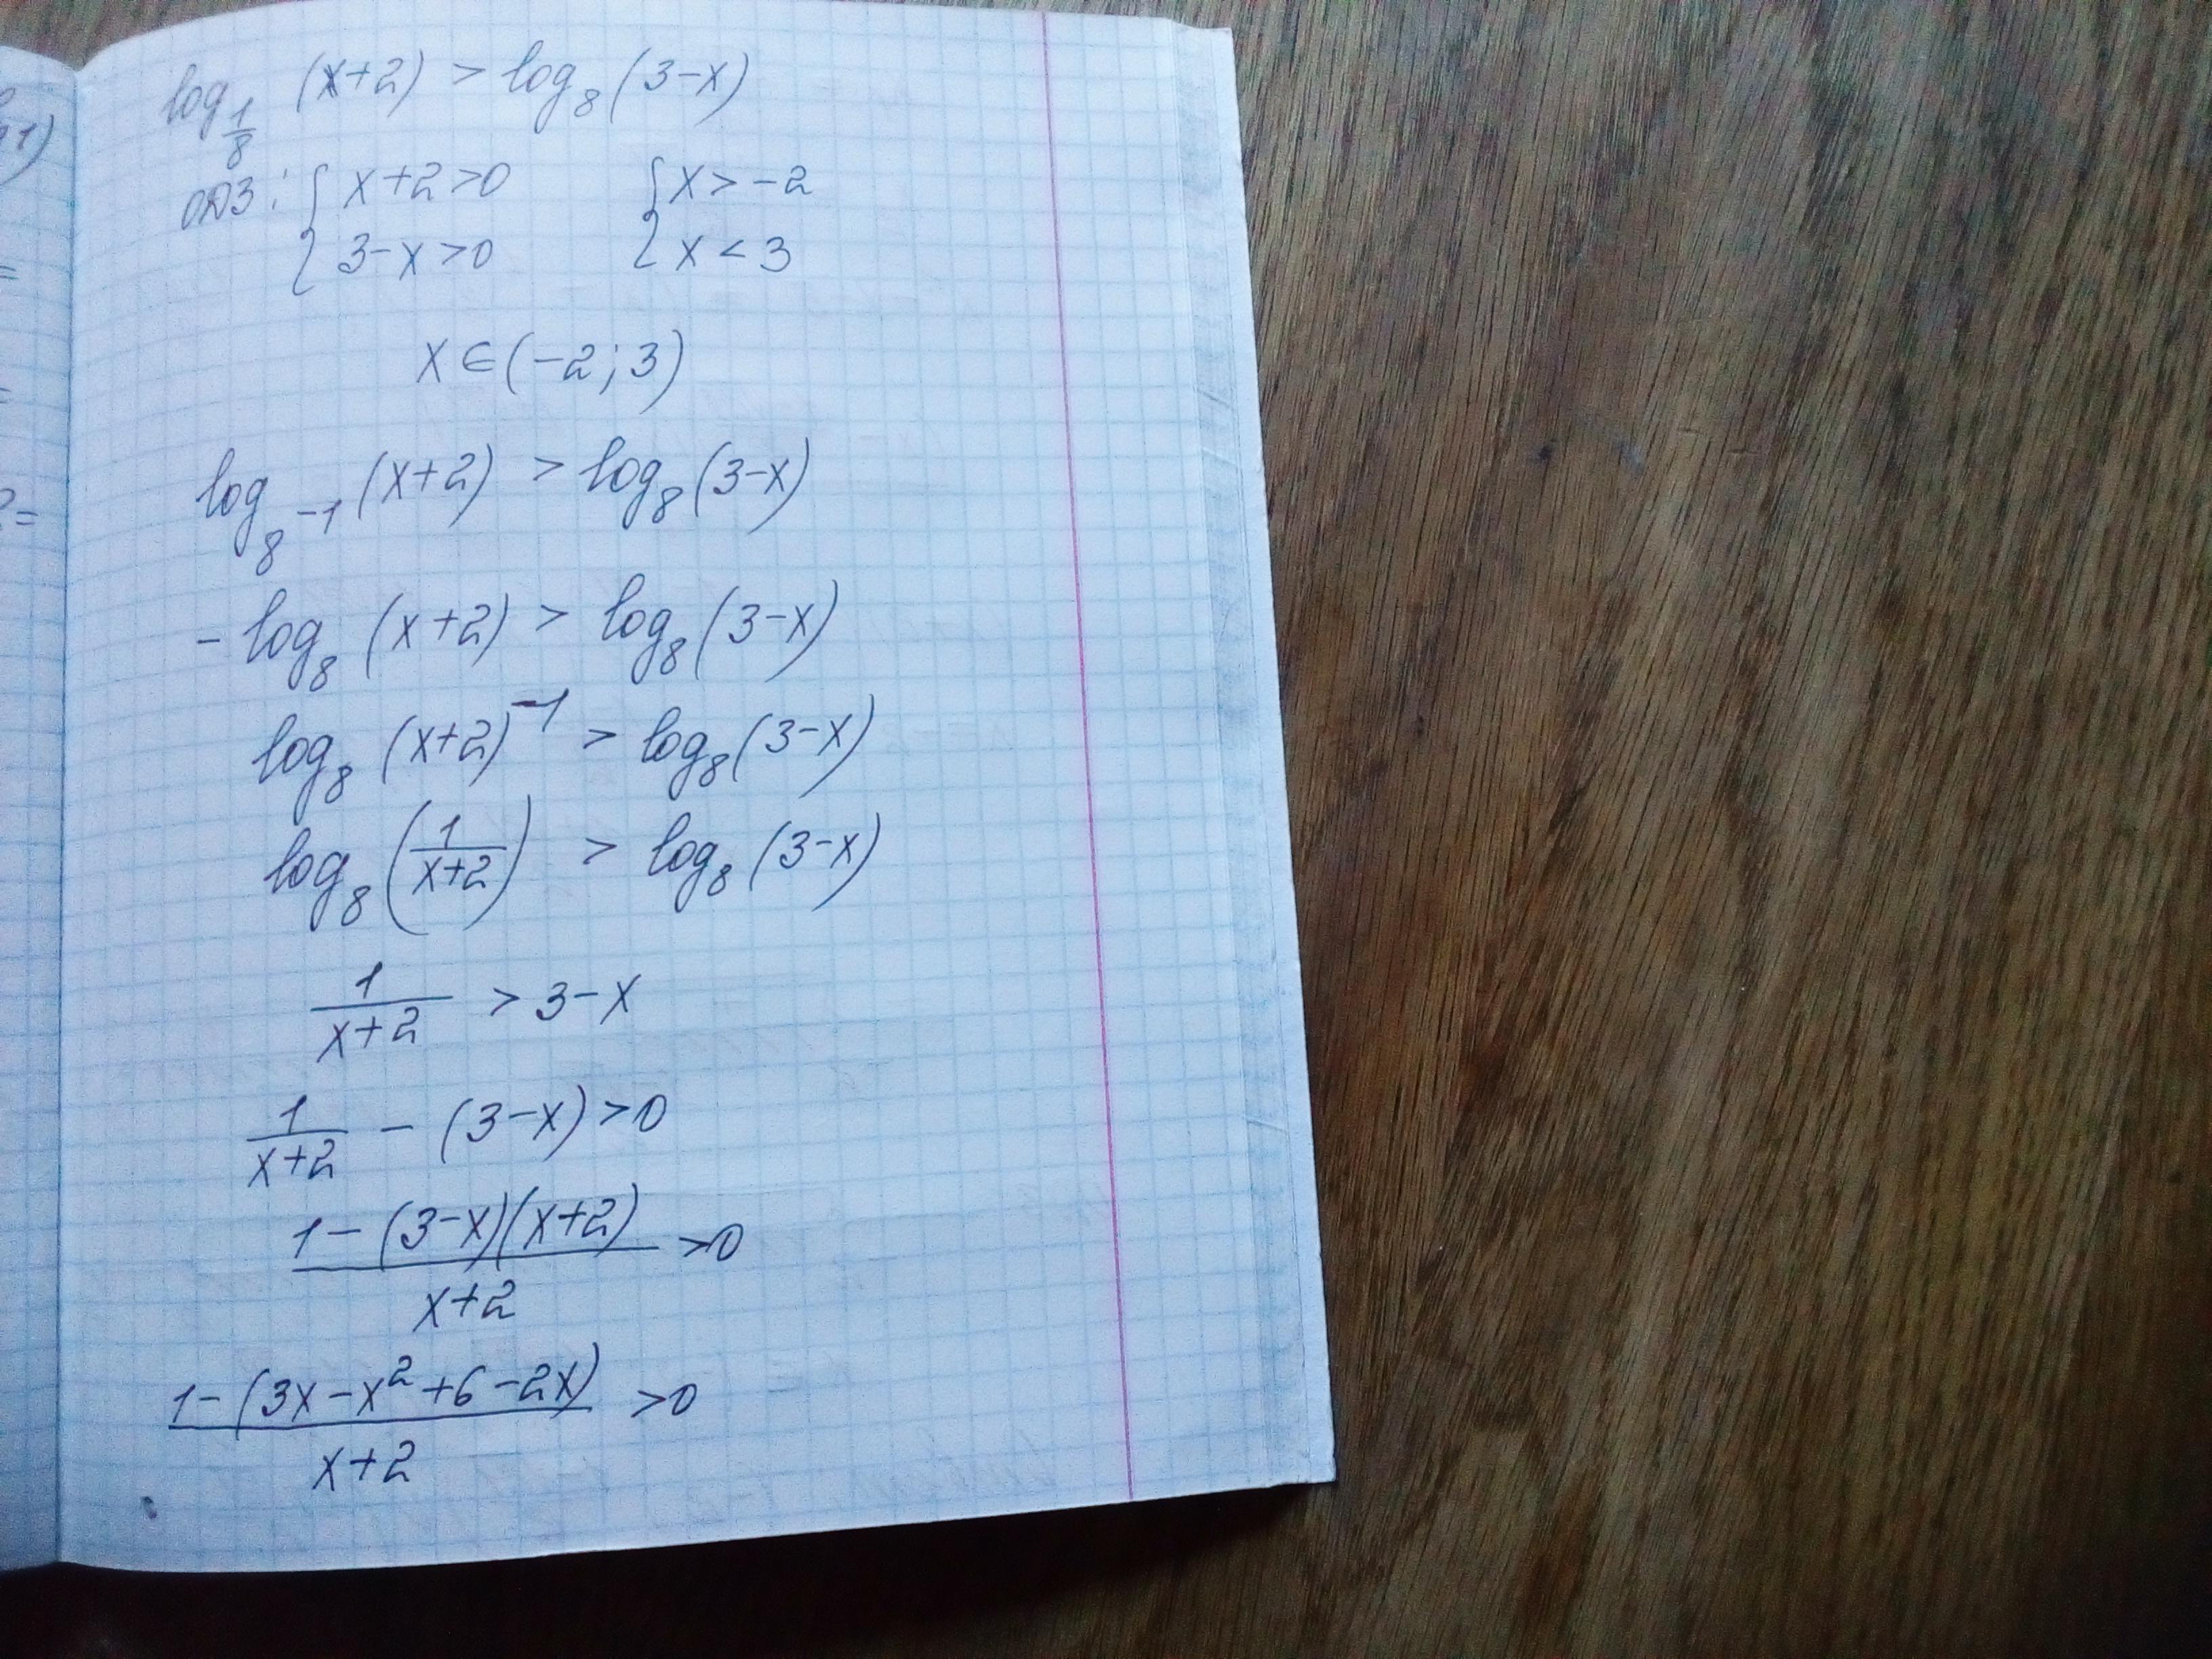 Log1/8(х+2)>log8(3- х)